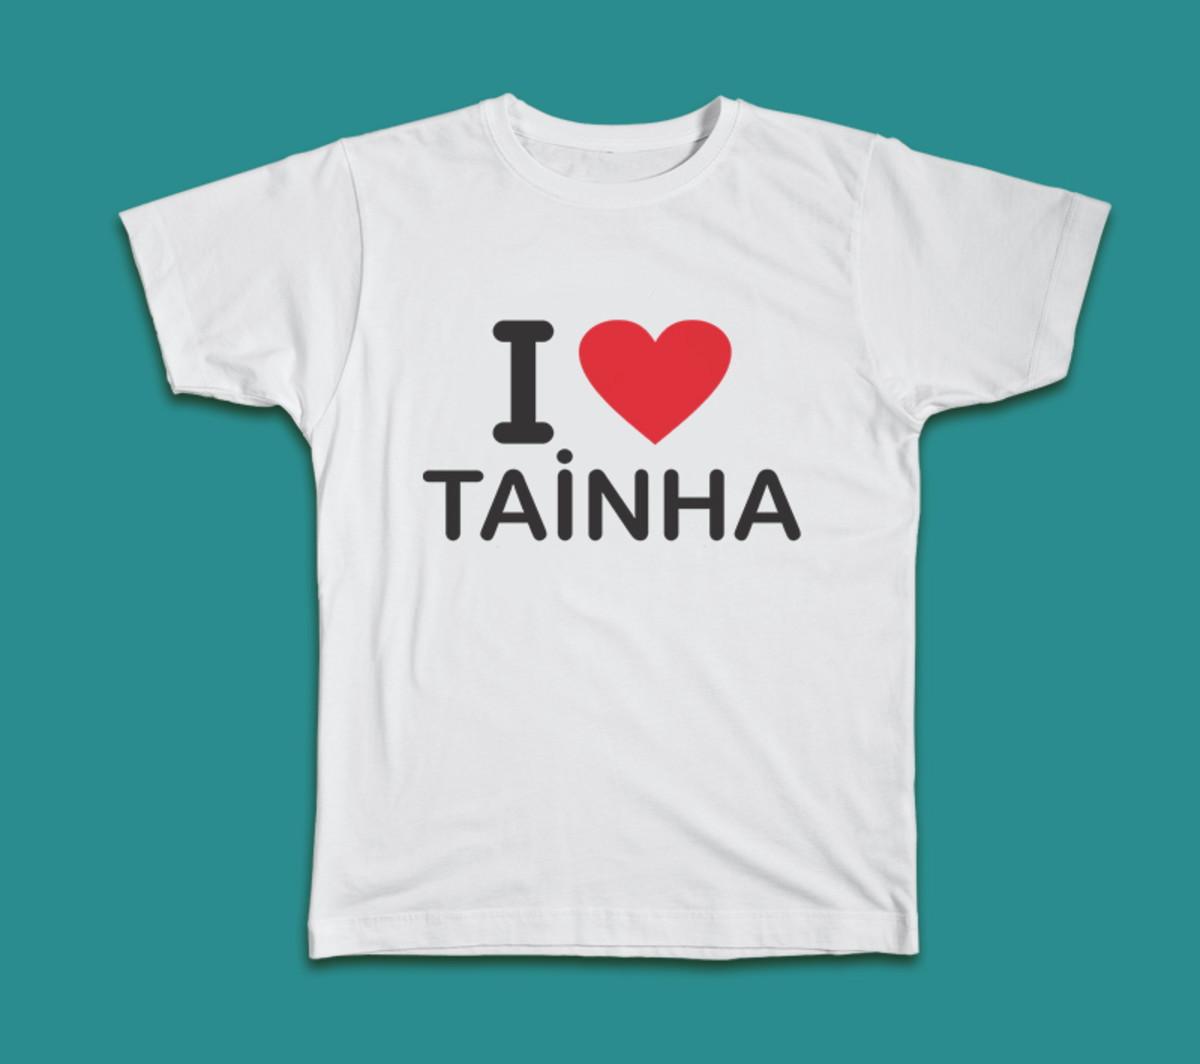 63fdb4b262 CAMISETA I LOVE TAINHA - tradicional ou baby look no Elo7